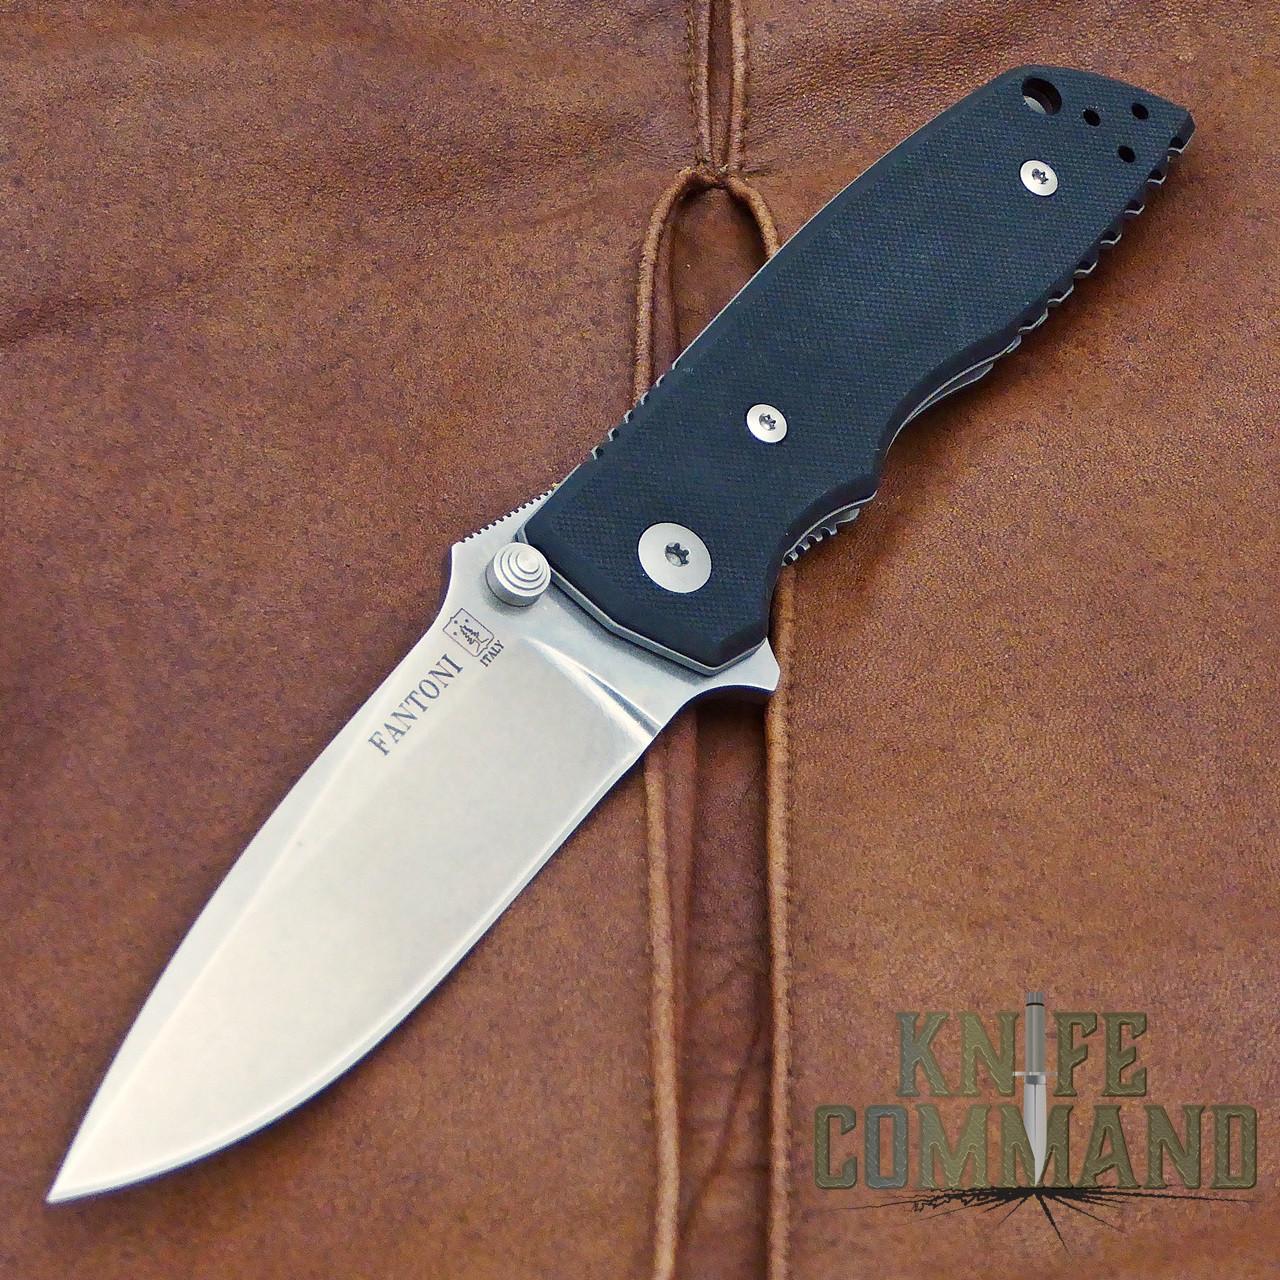 Fantoni HB 01 William Harsey Combat Folder Tactical Knife S30V.  The Classic combat knife.